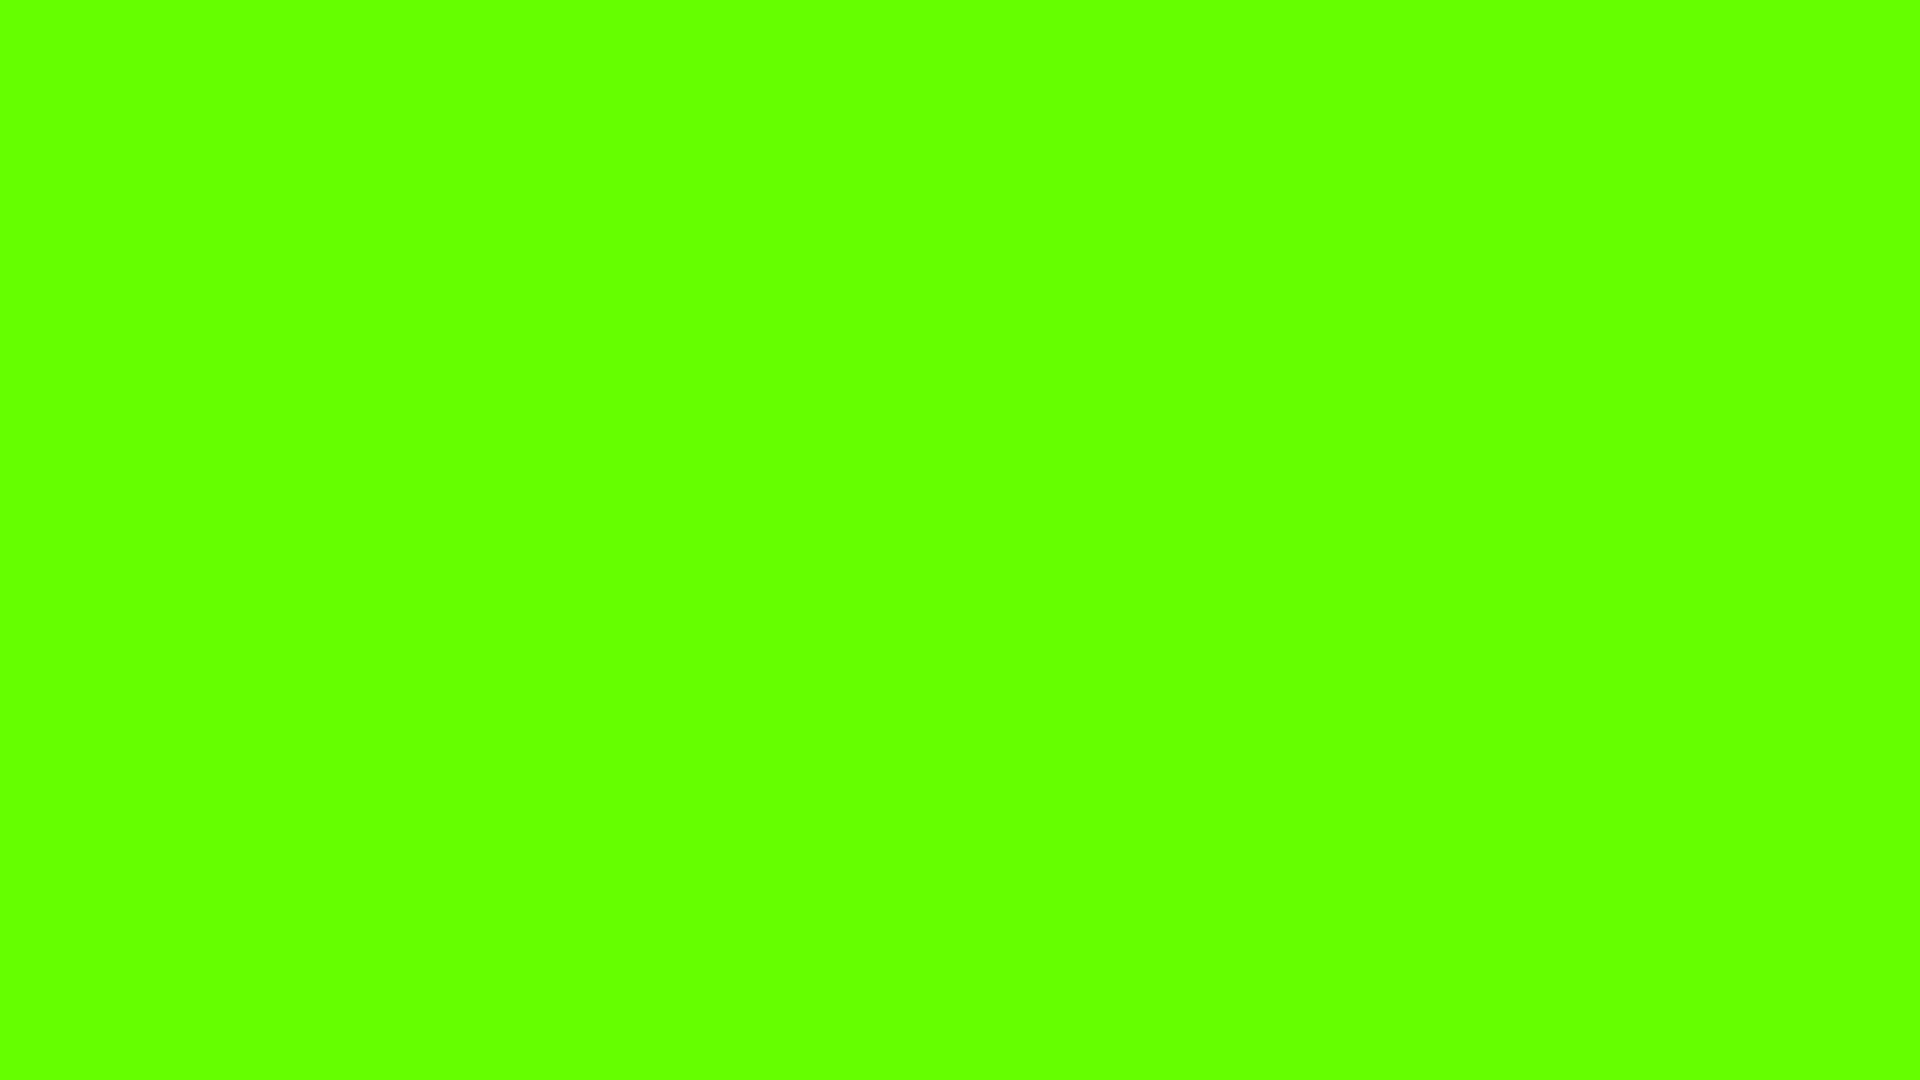 How To Get Flourecent Colors In Paint